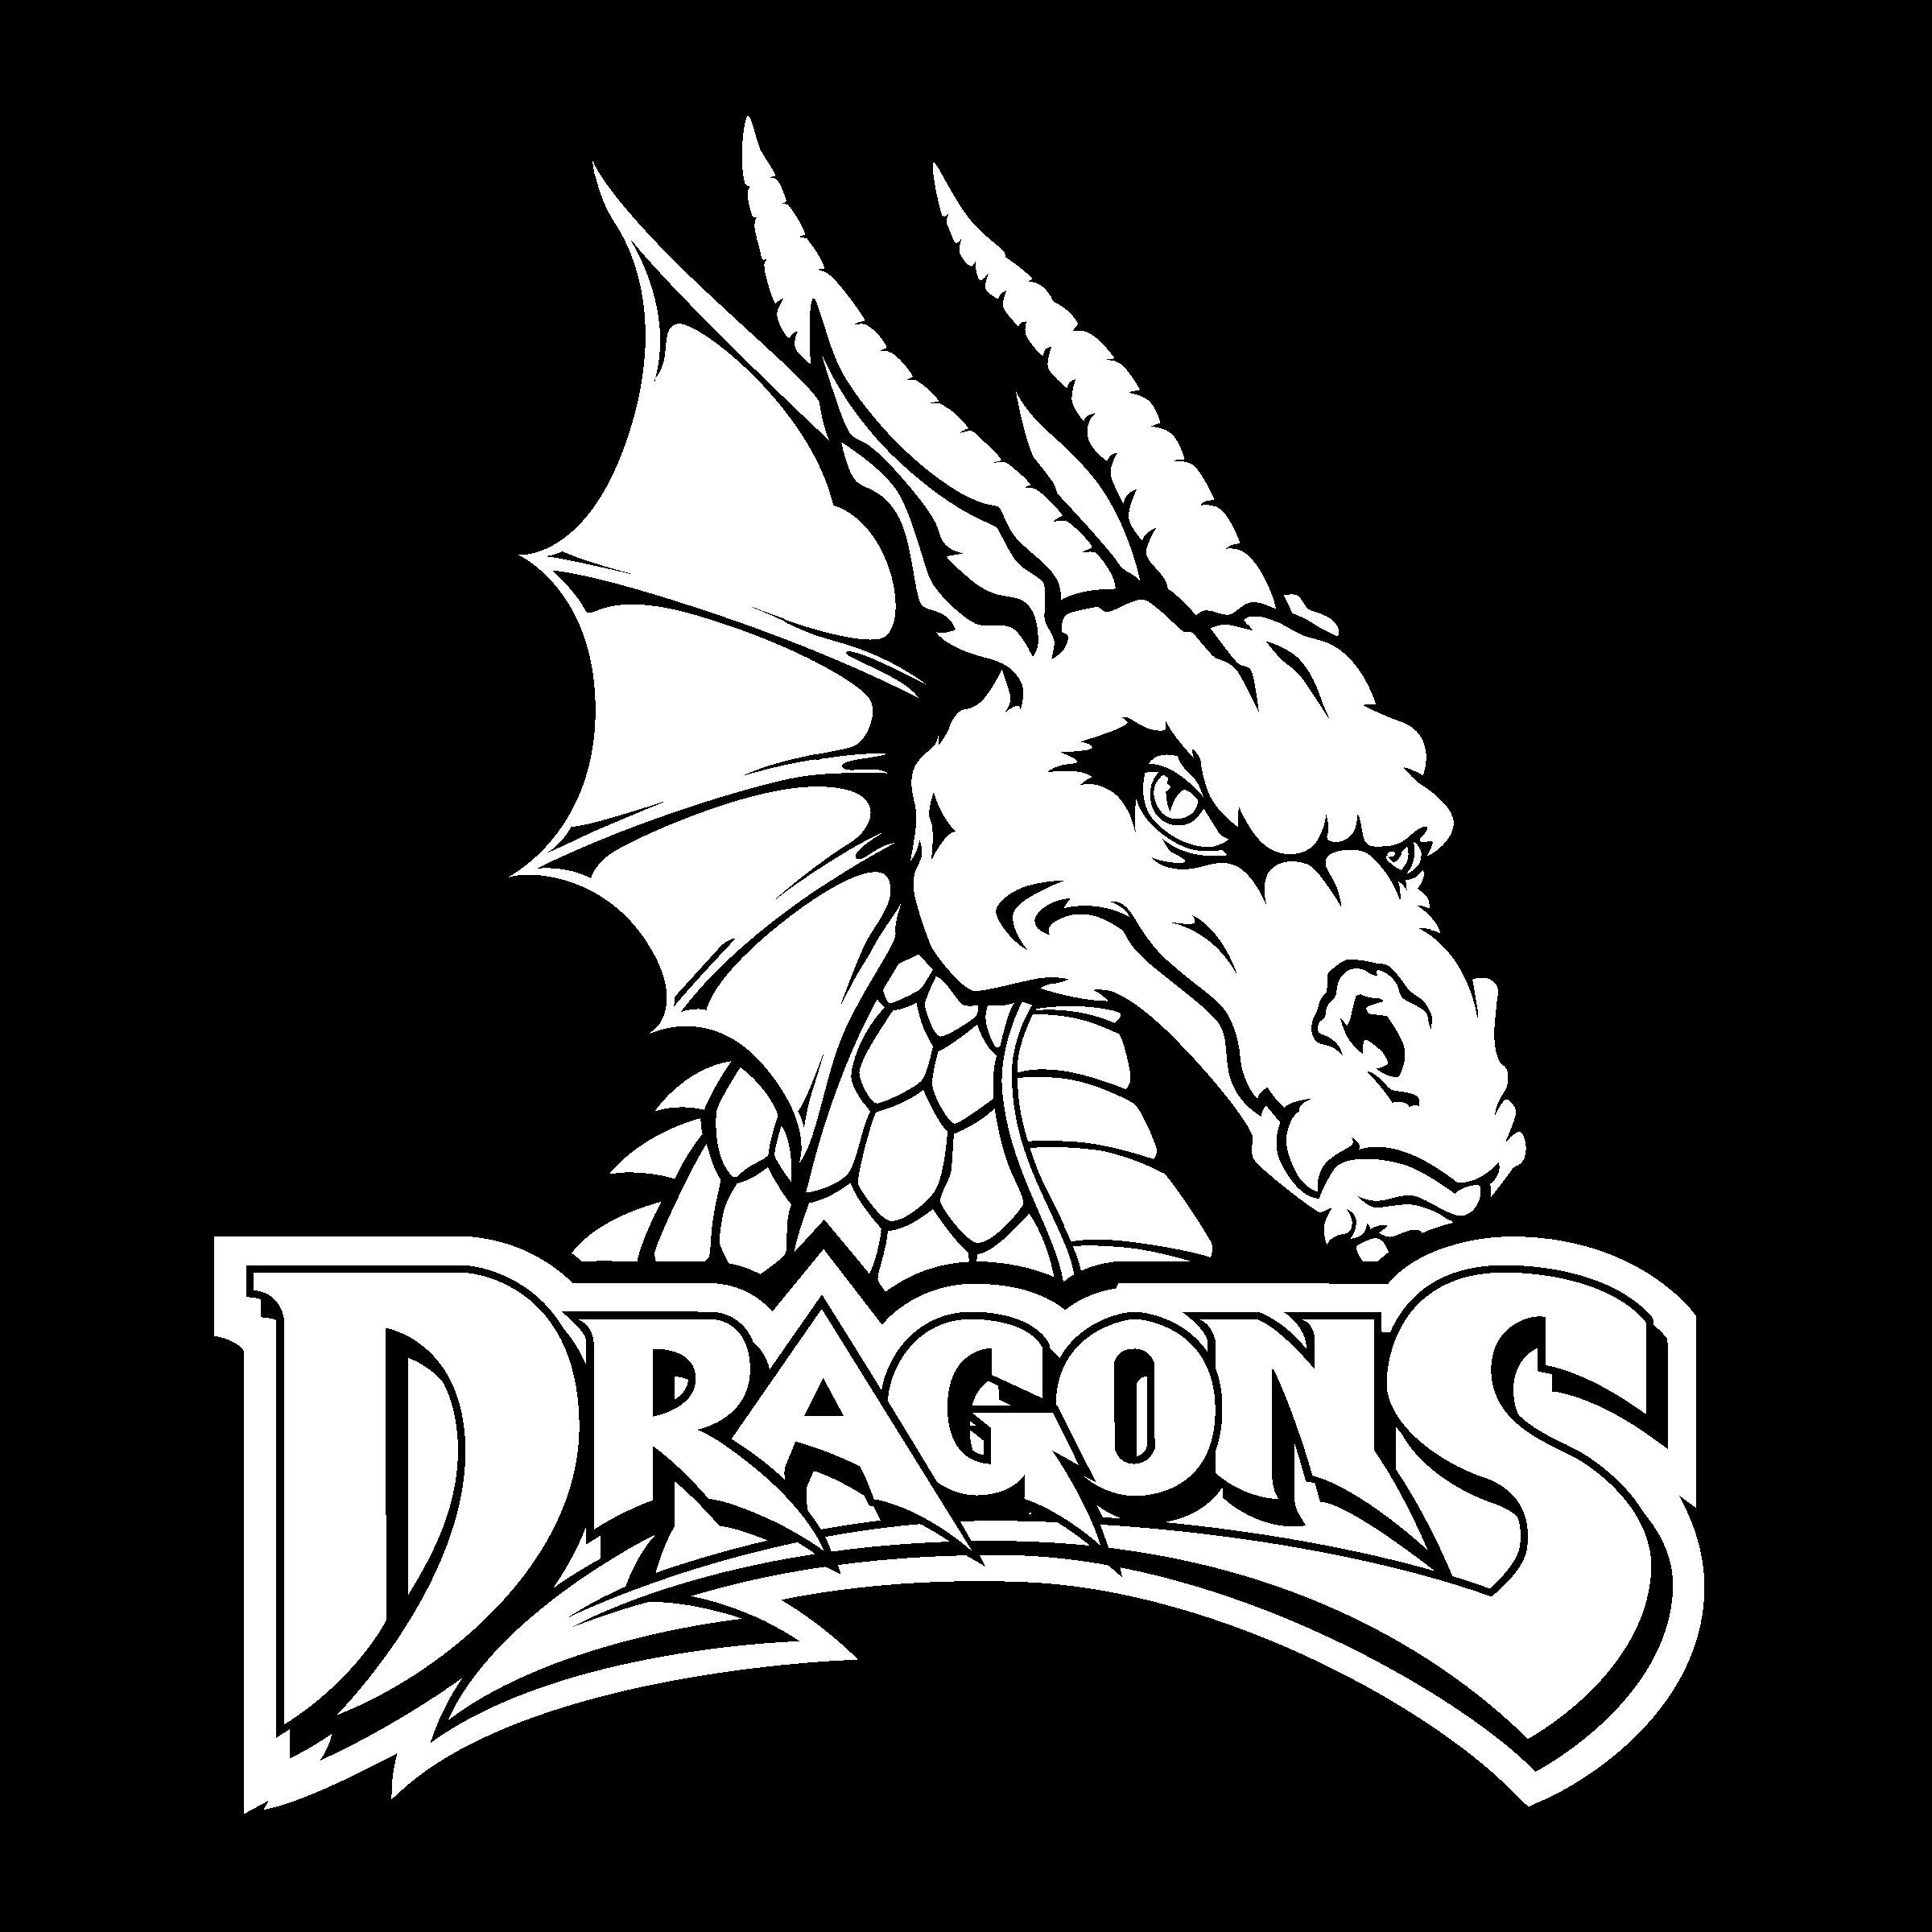 dayton dragons logo png transparent amp svg vector freebie